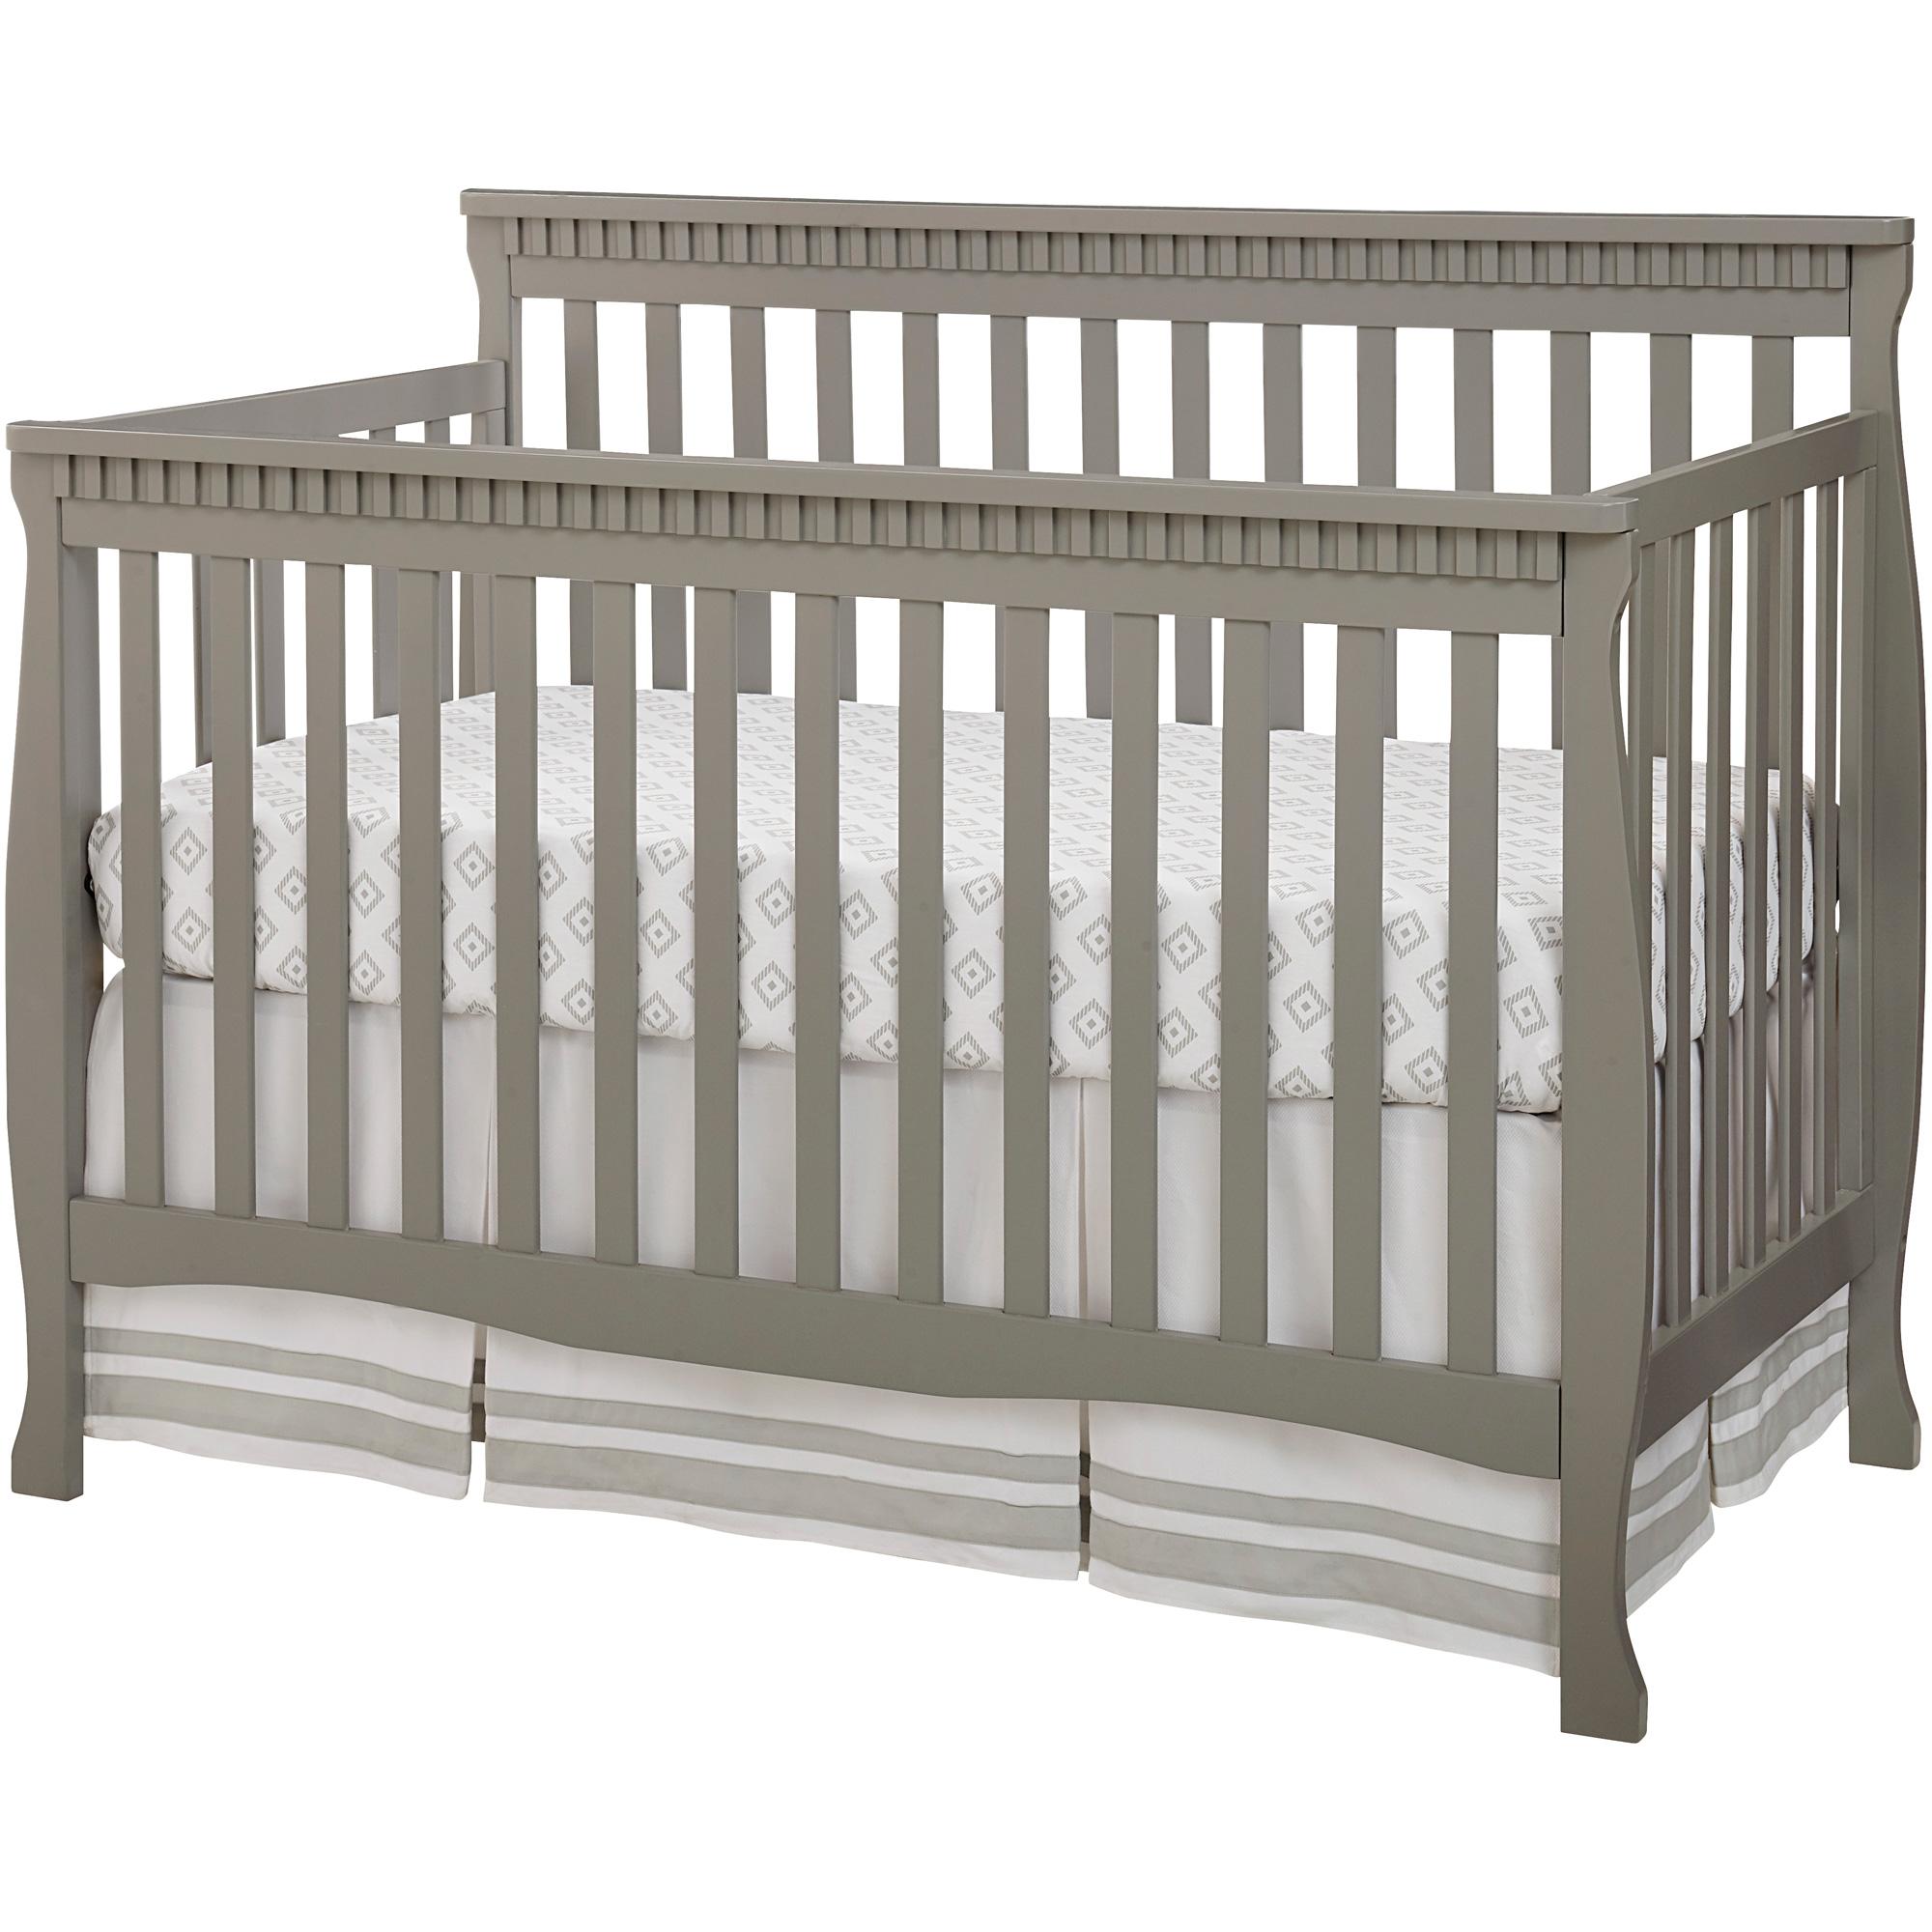 Westwood Design | Emery Gray Slat Crib